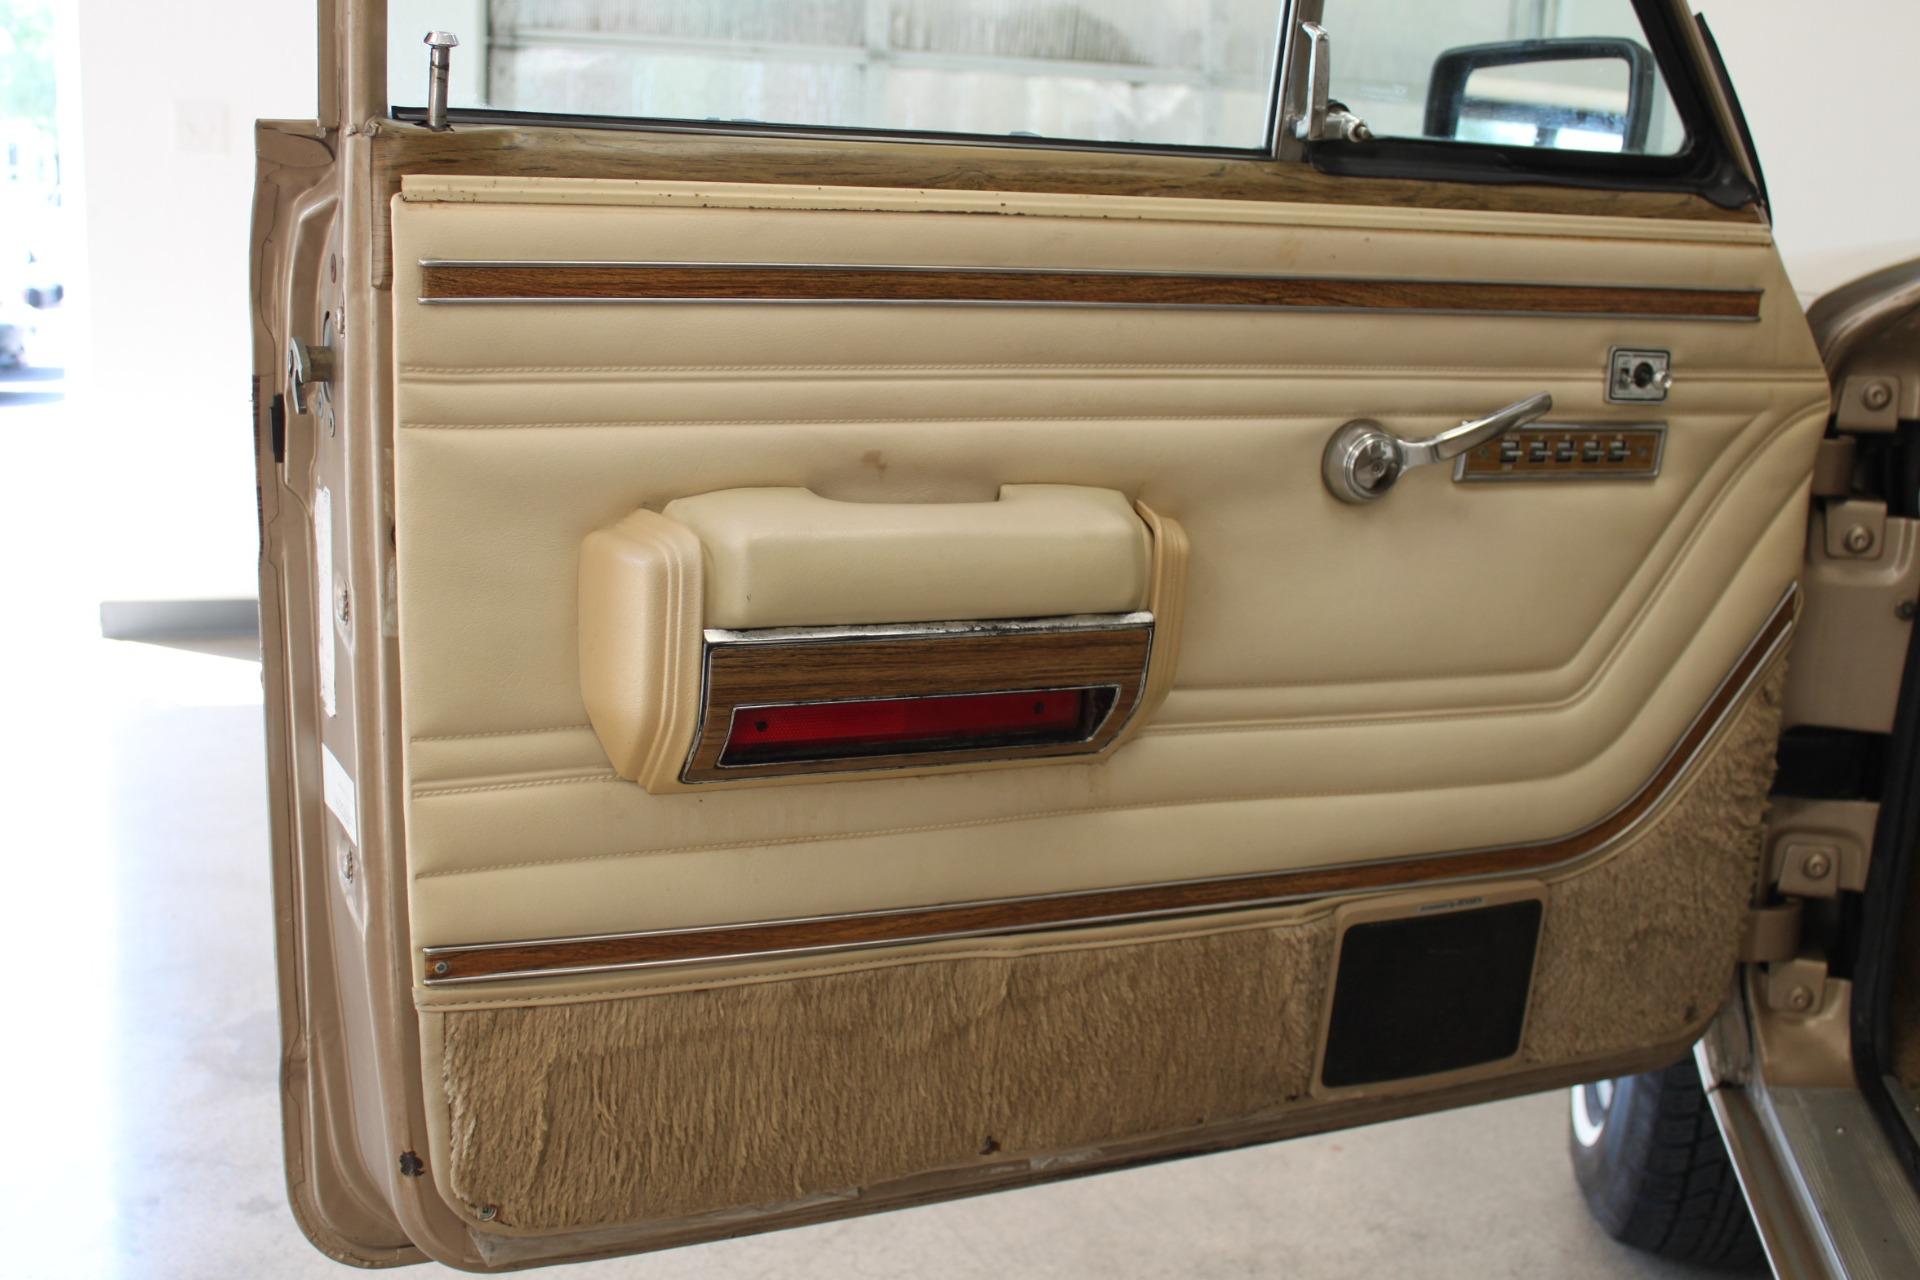 Used-1990-Jeep-Grand-Wagoneer-Wagoneer